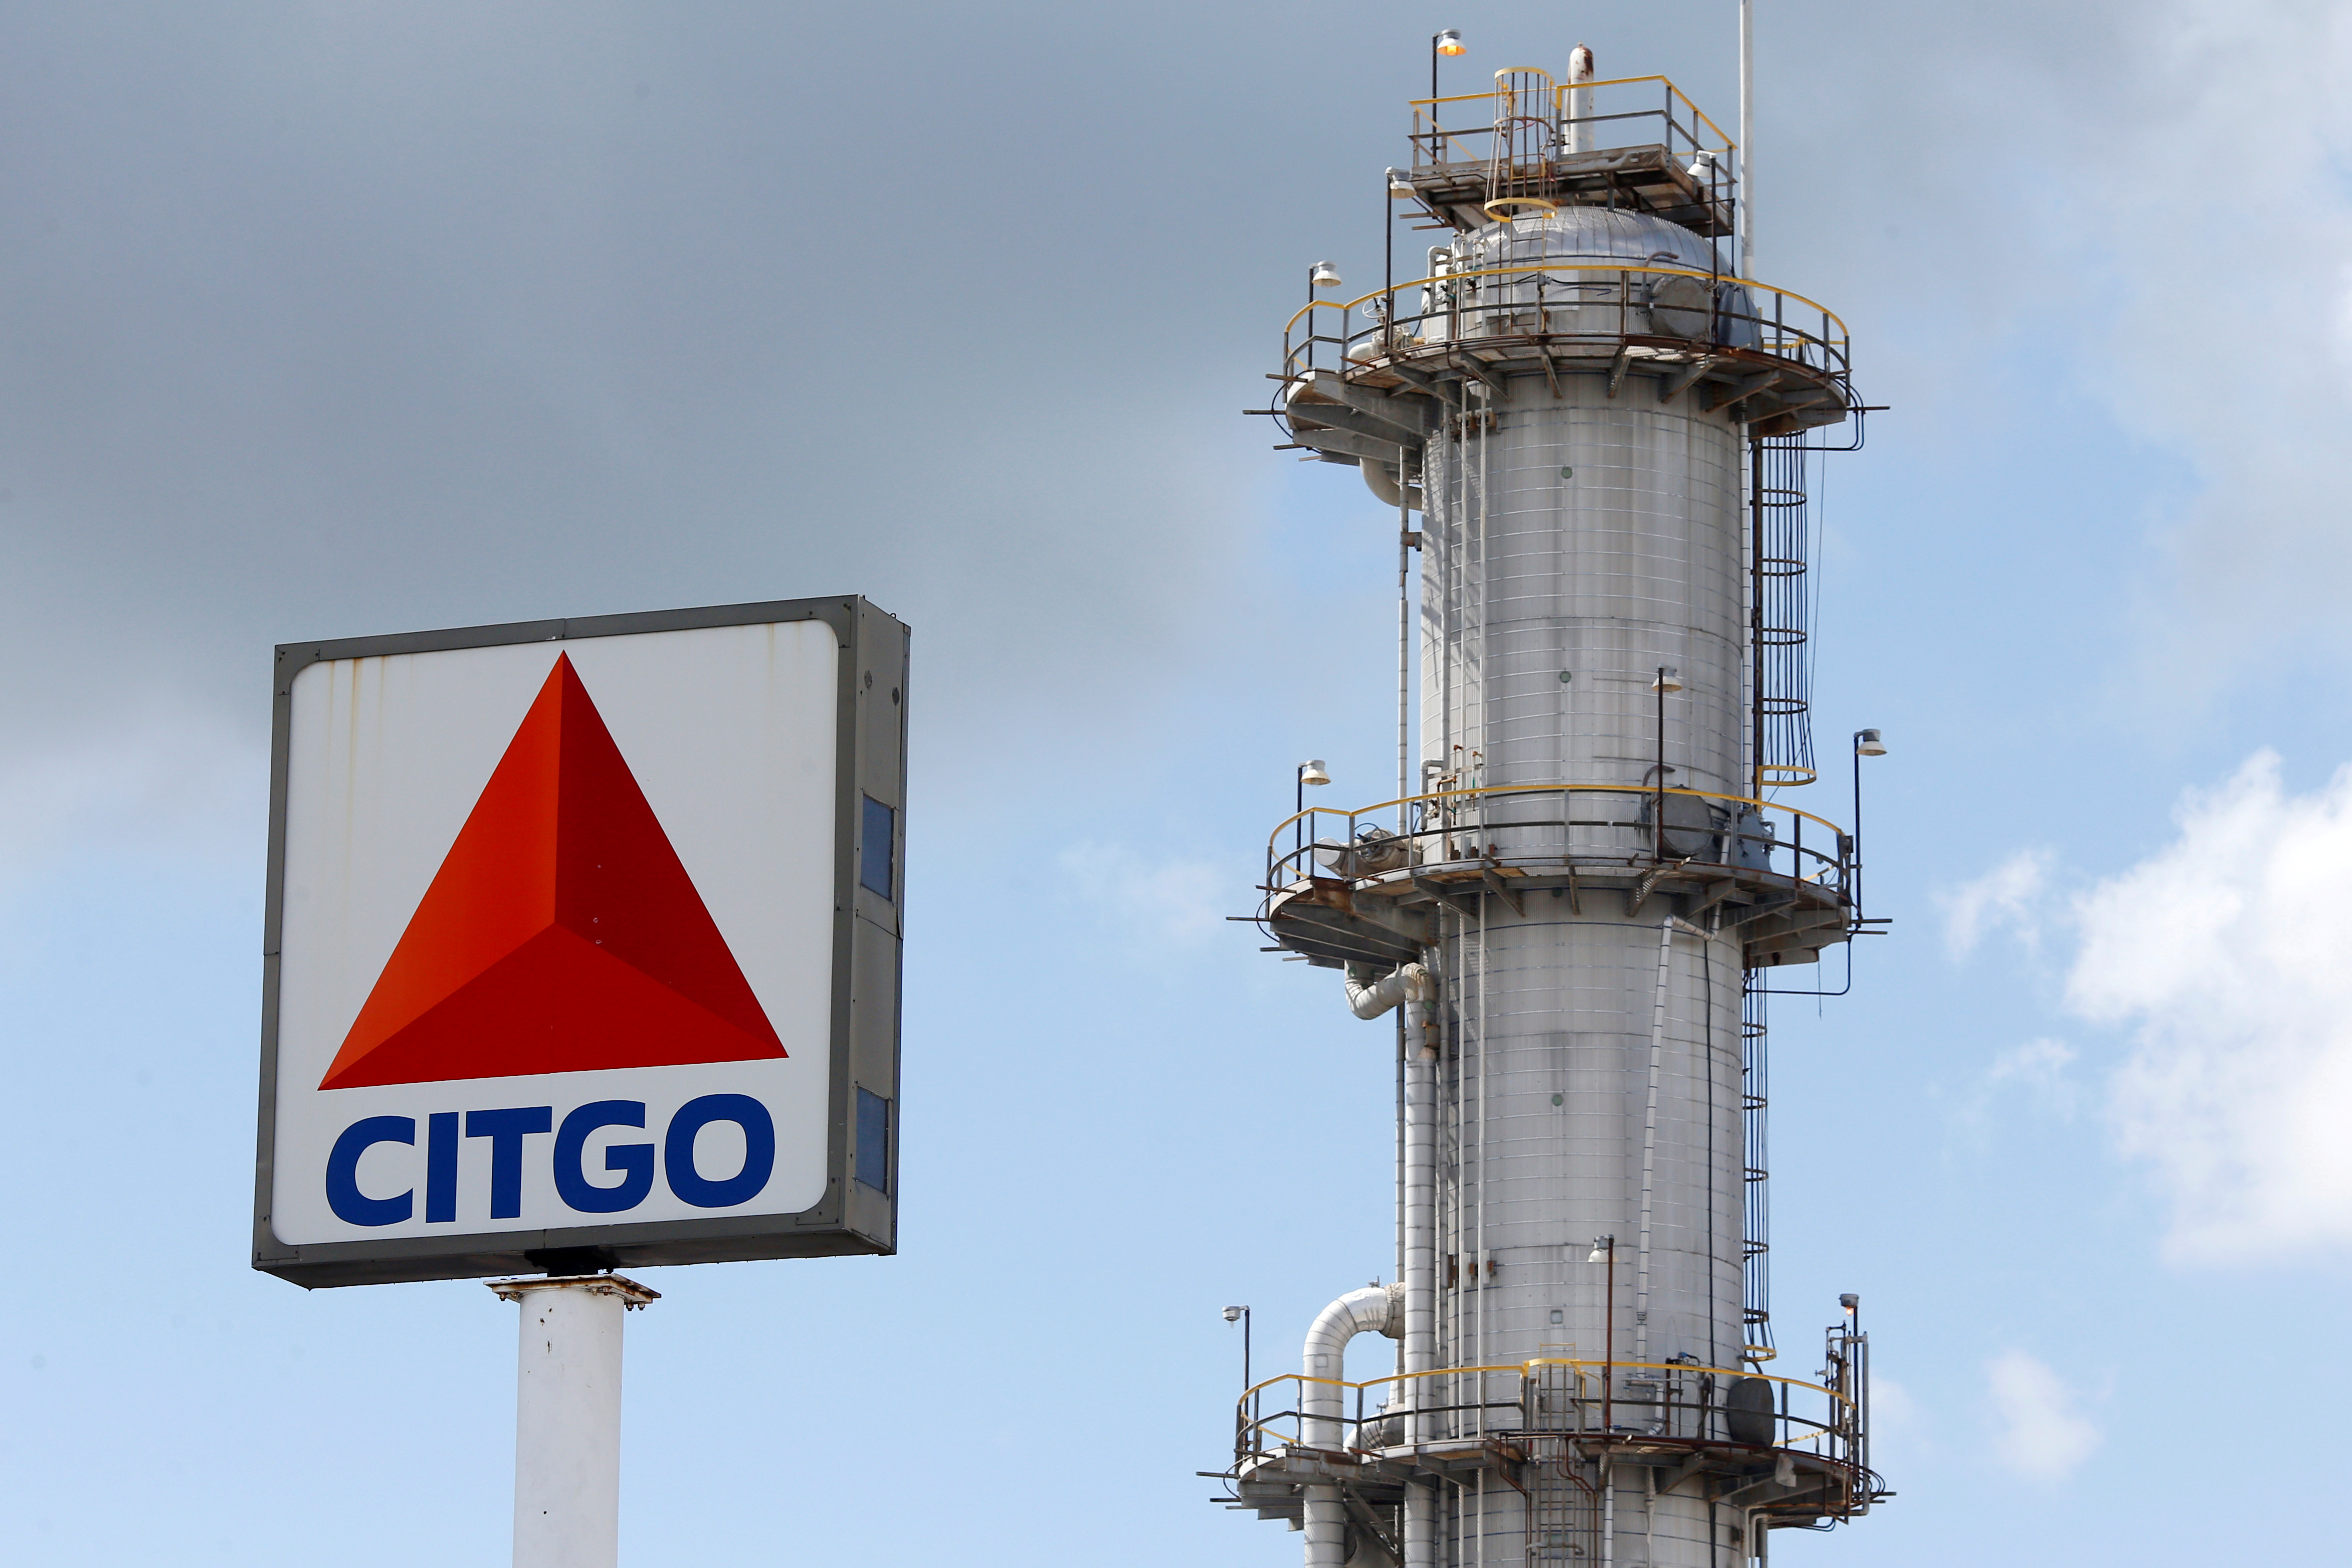 PDVSA's U.S. unit Citgo Petroleum refinery is pictured in Sulphur, Louisiana, U.S., June 12, 2018. REUTERS/Jonathan Bachman